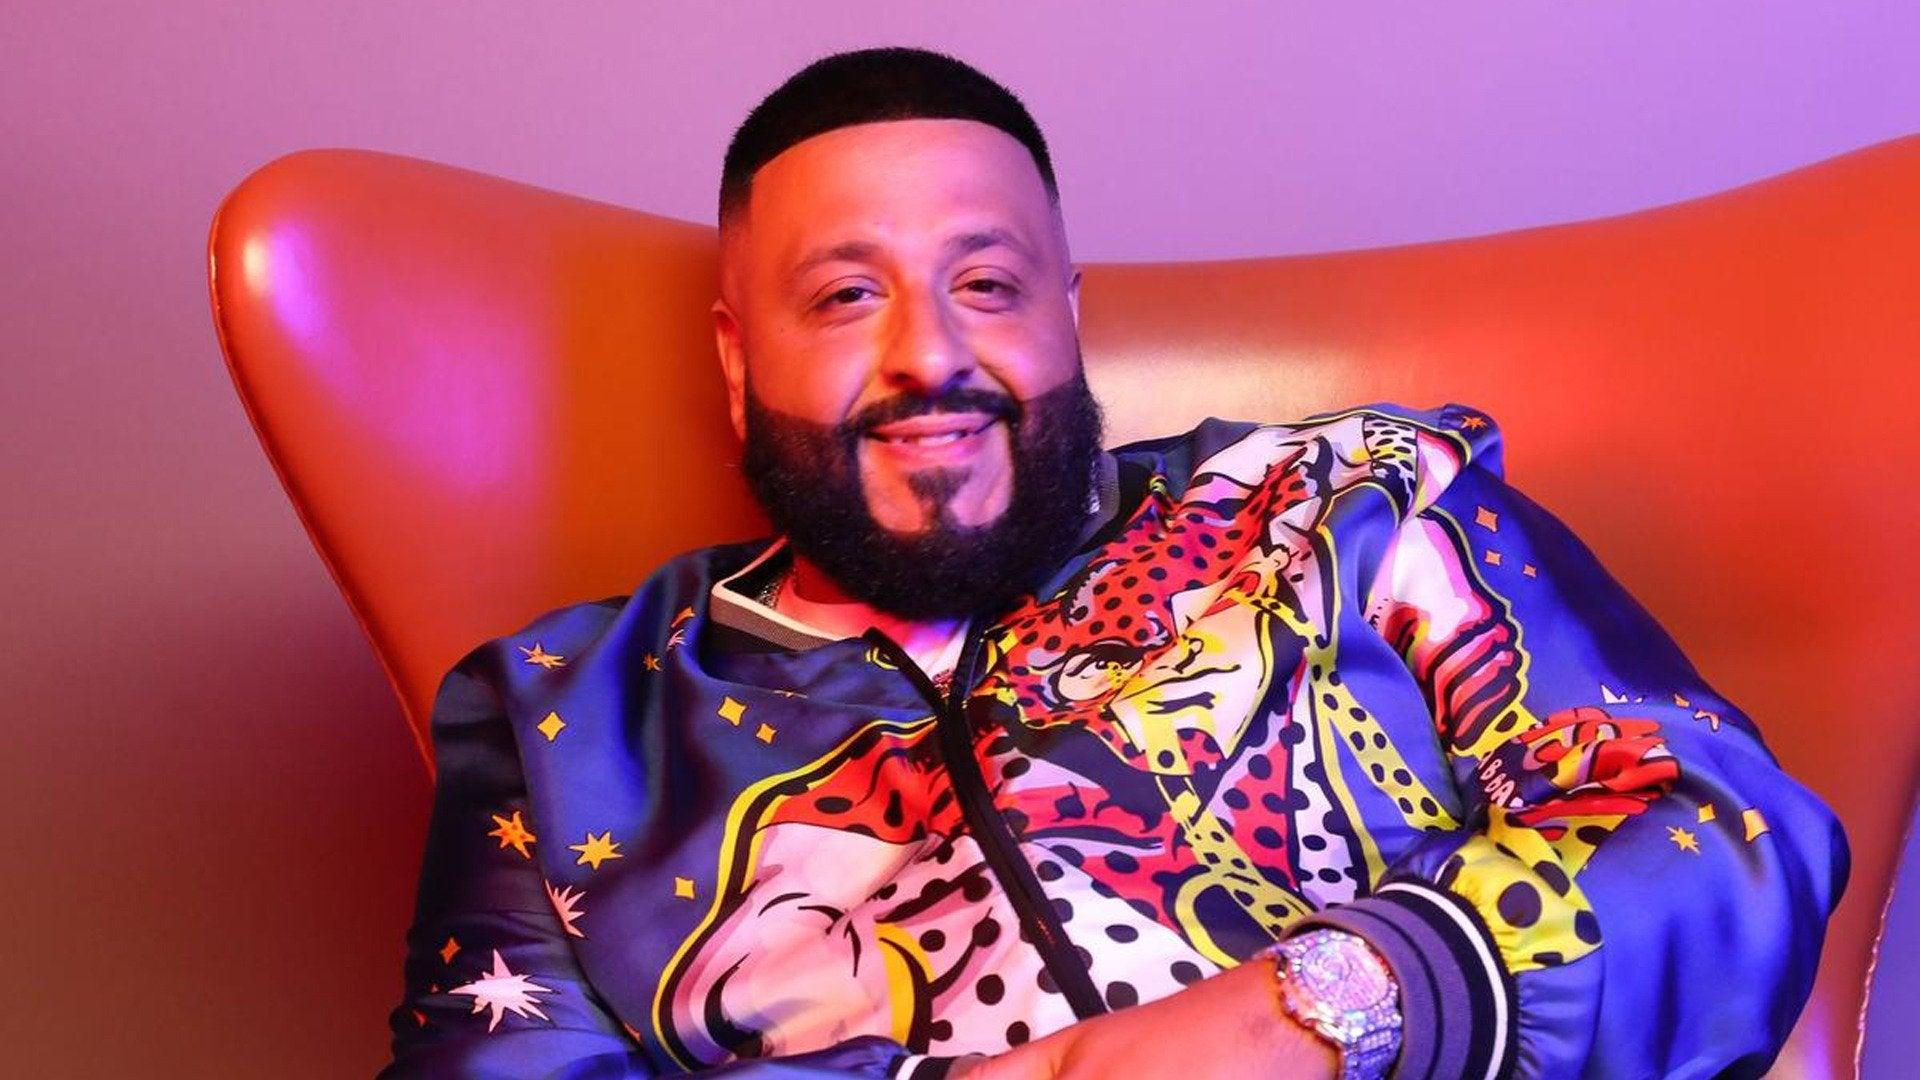 DJ Khaled: The Ride